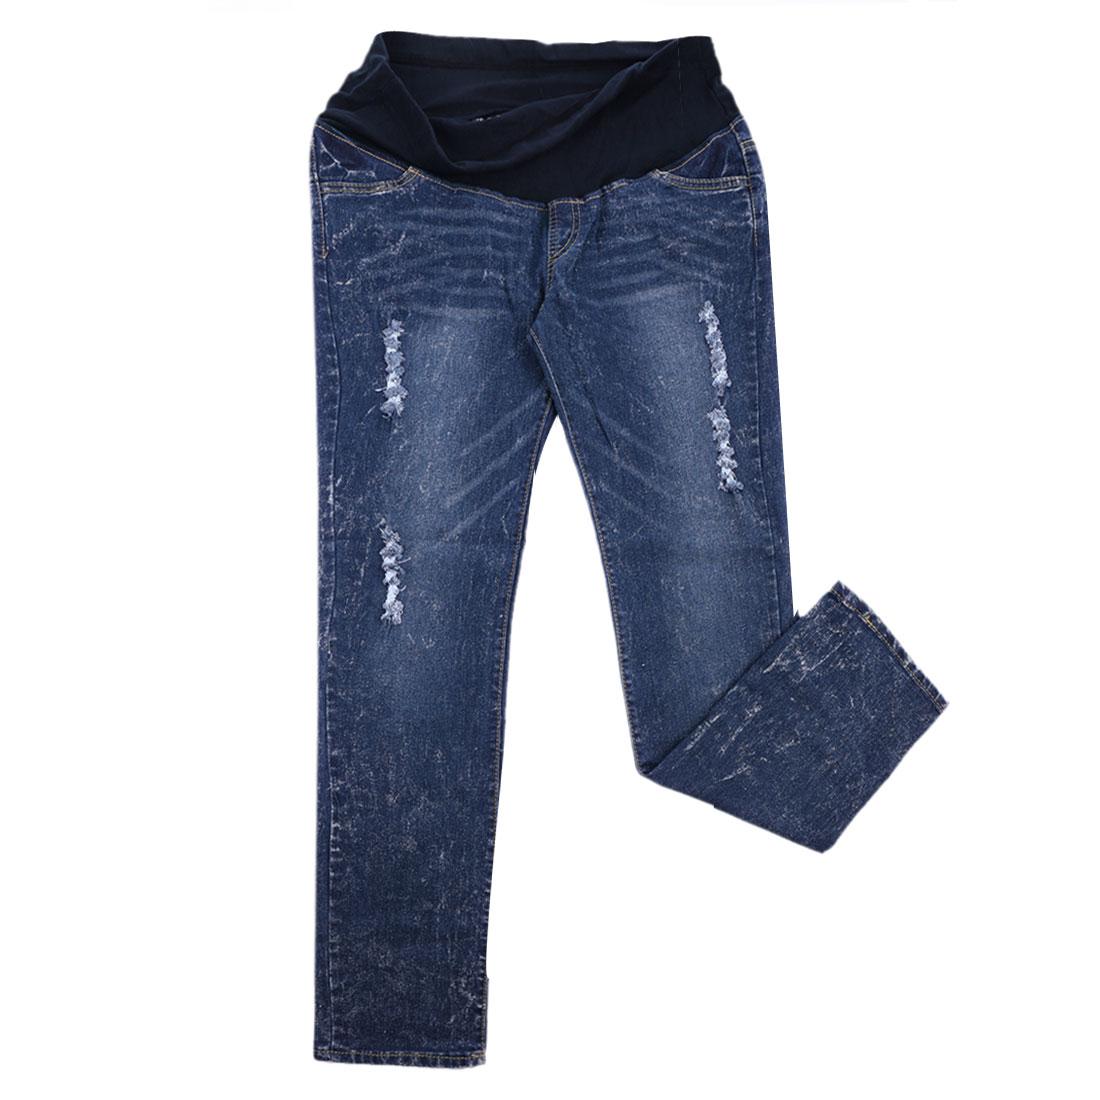 Matherhood Stretchy Waist Pockets Destroyed Detail Pants Dark Blue S